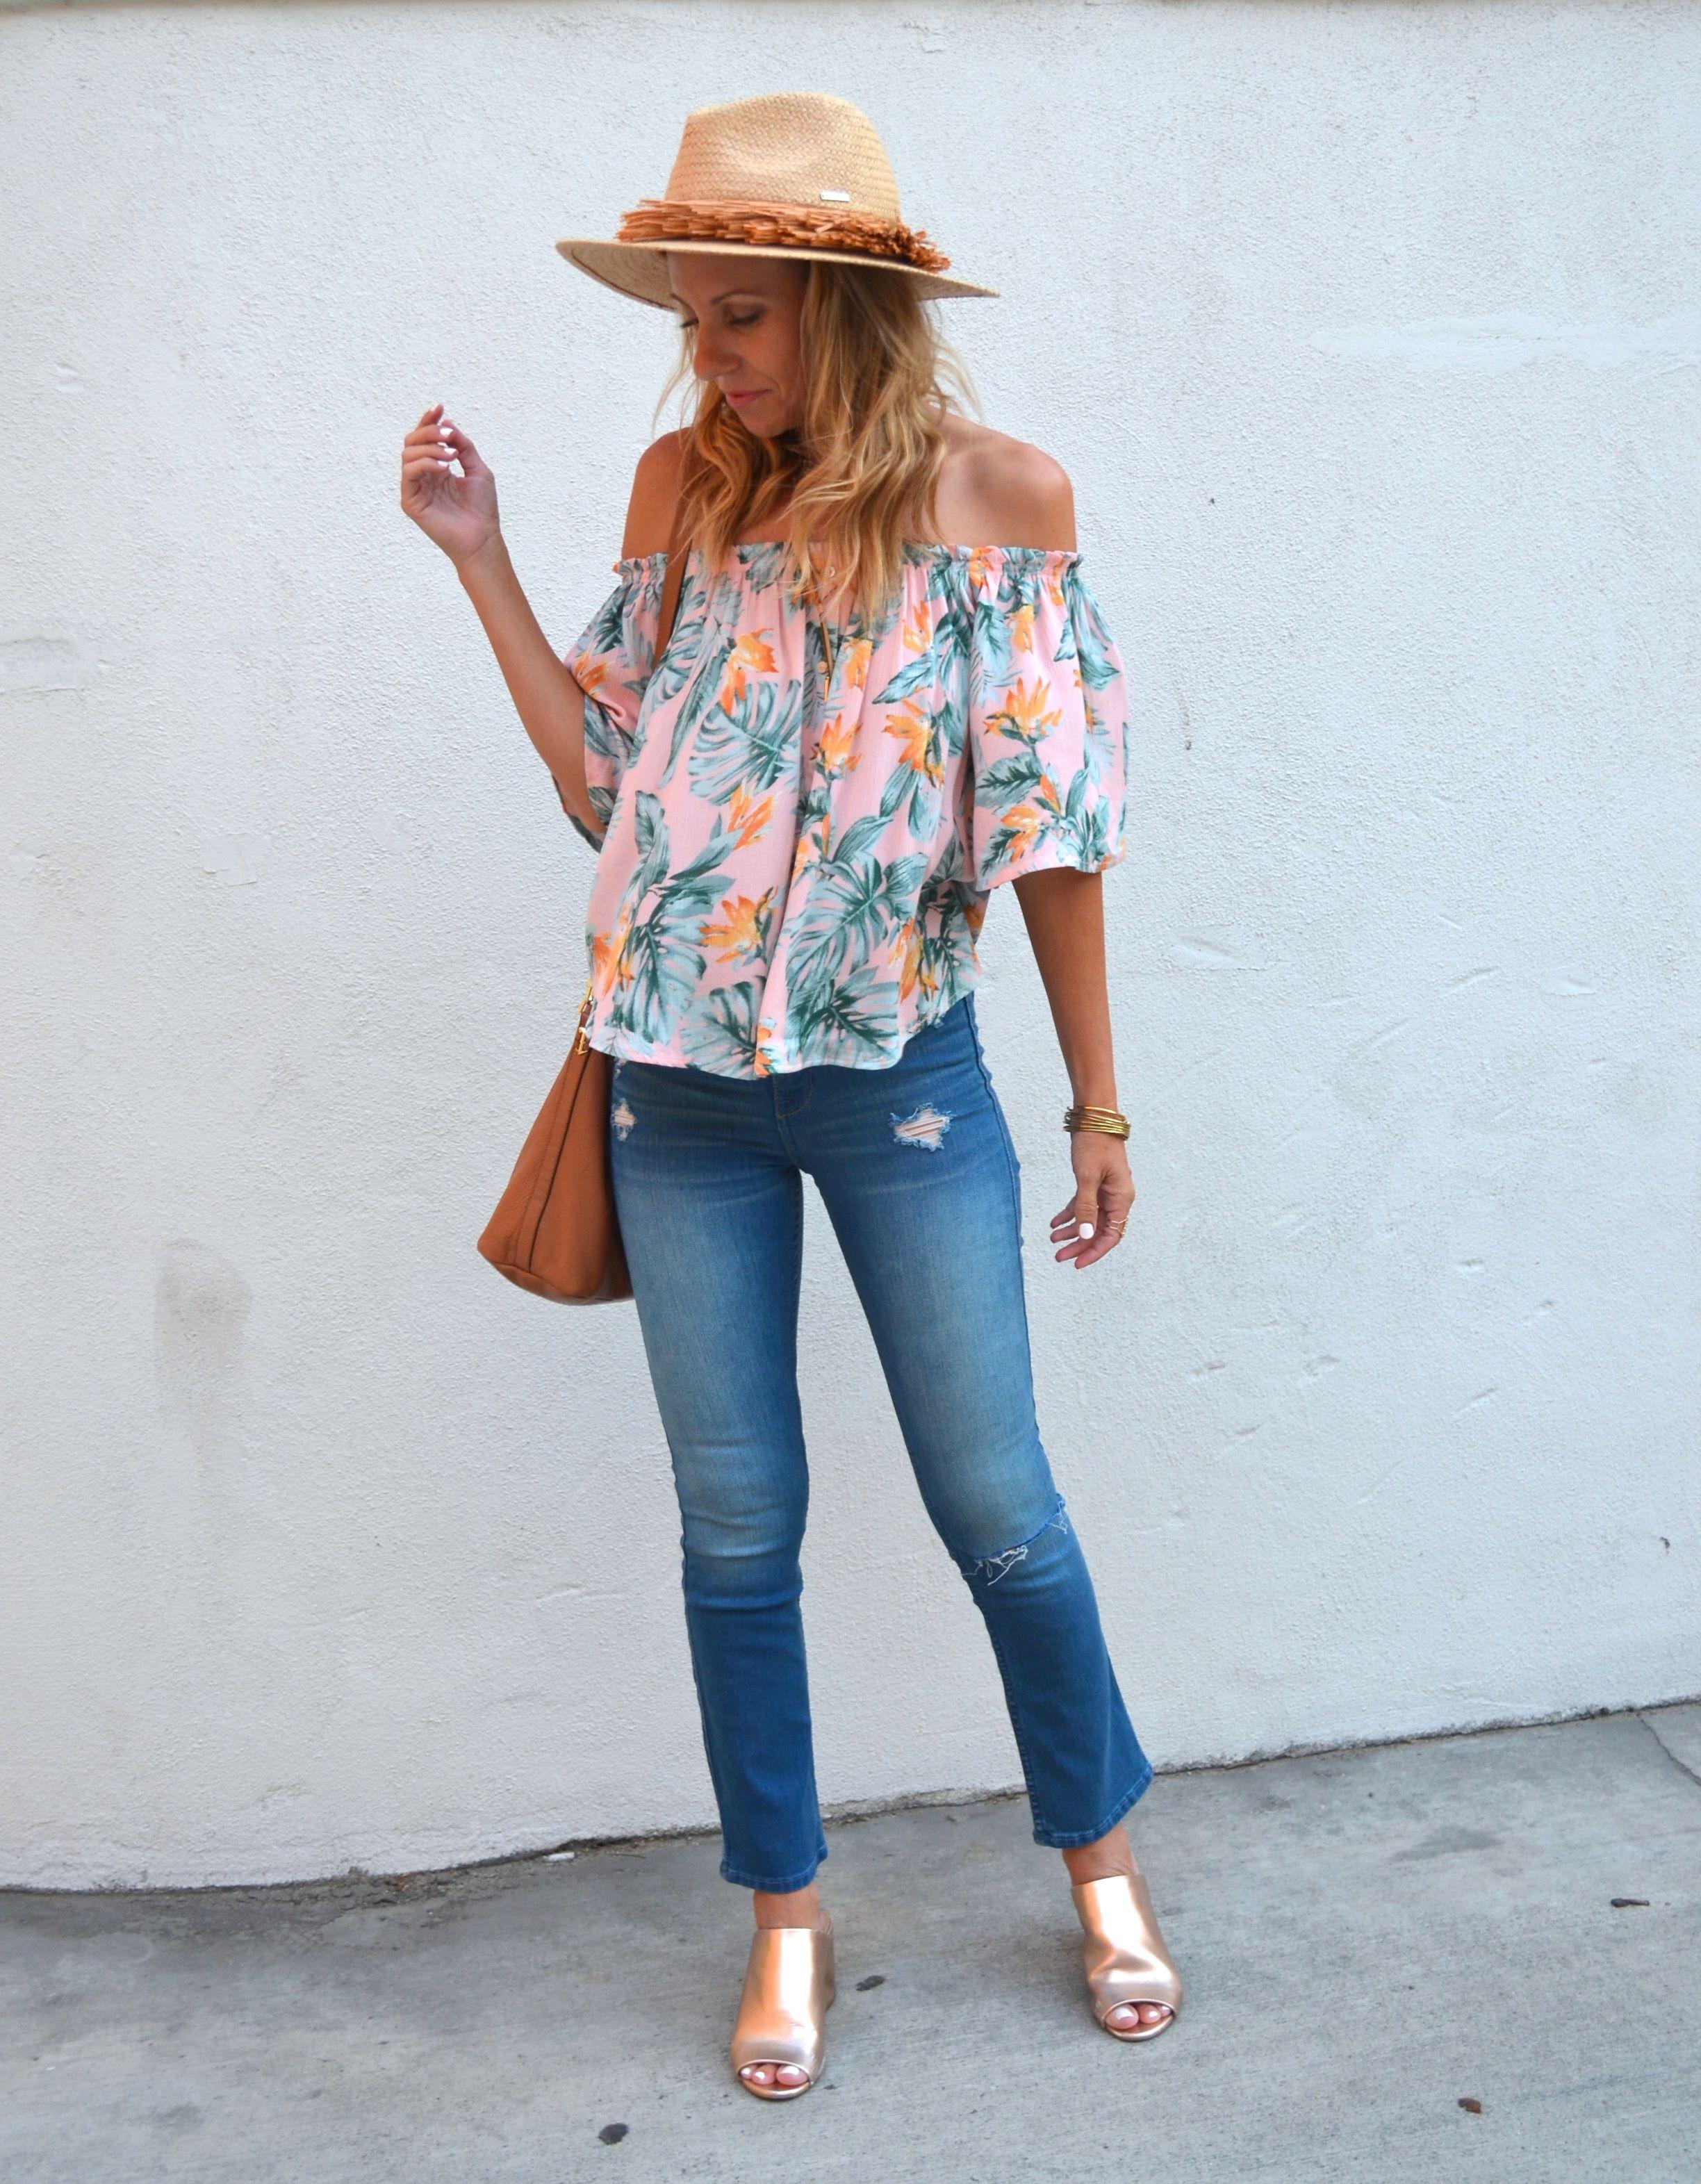 b2dd481f774 Las Vegas Outfit Roundup - Jaclyn De Leon Style